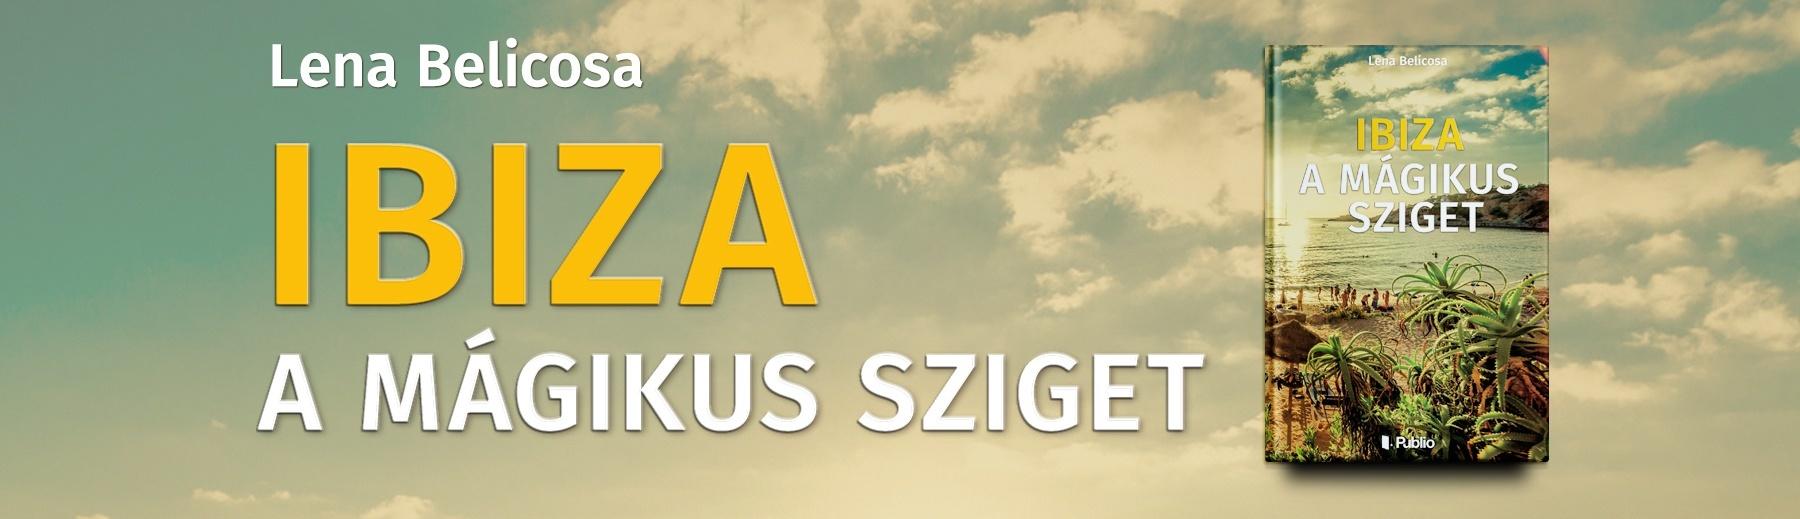 http://admin.konyvaruhaz.info/media/files/ibiza1800.jpg